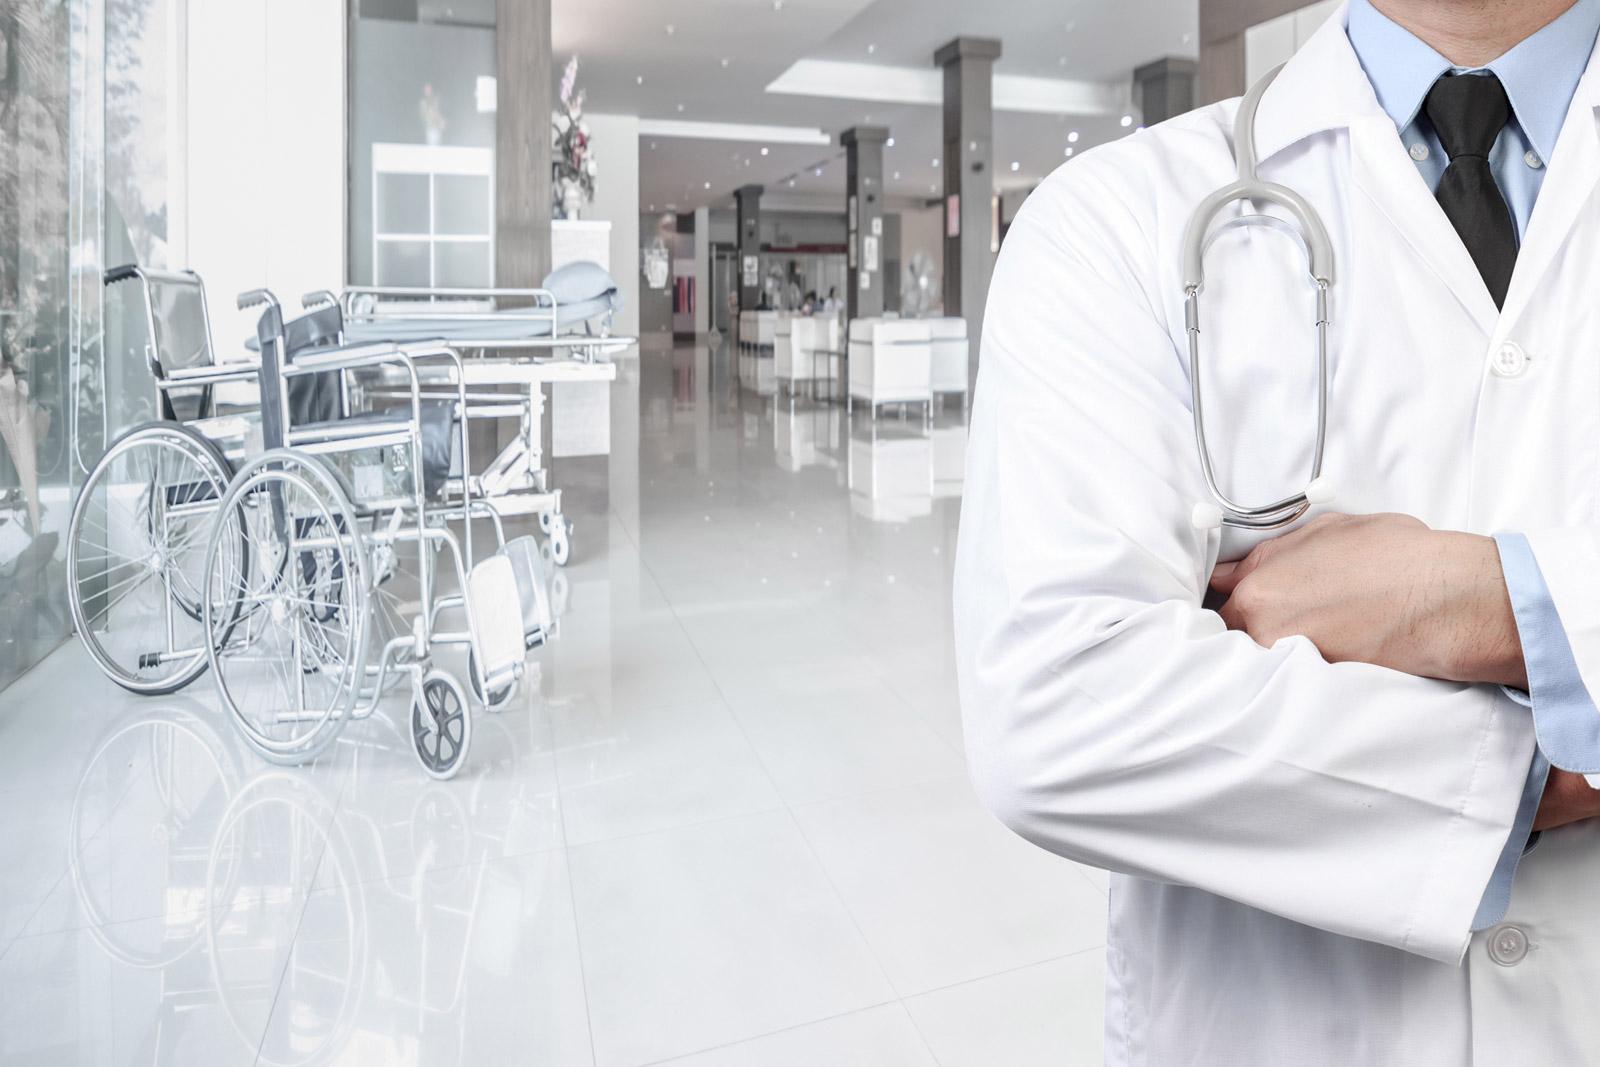 A doctor in a hospital corridor